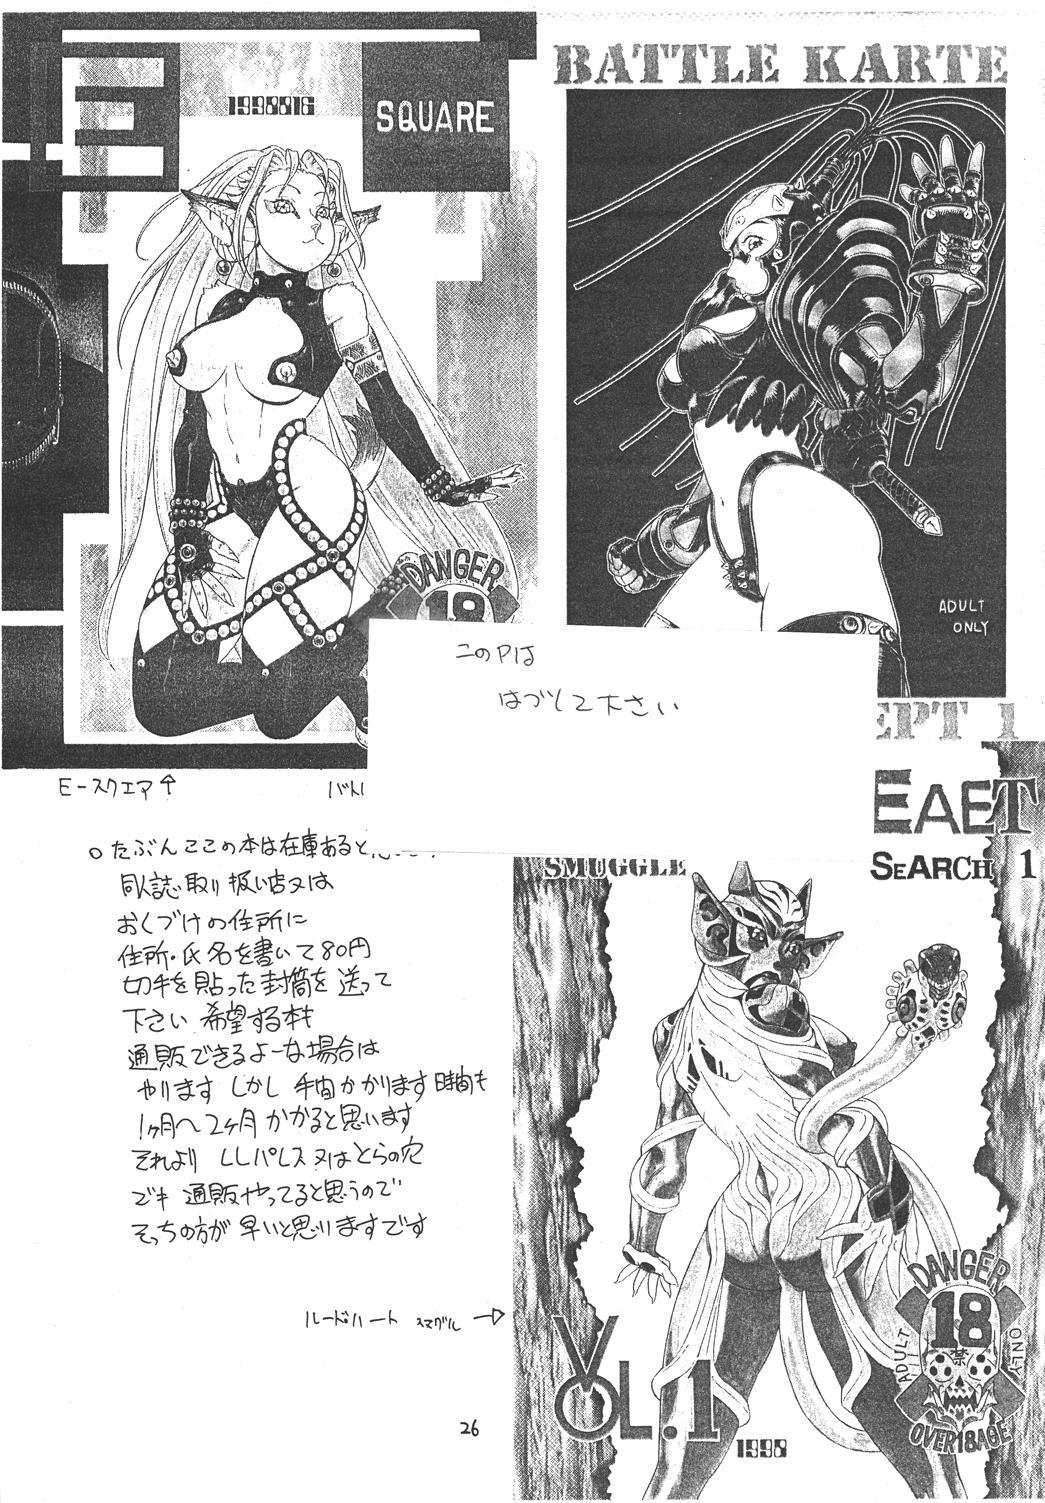 Fighters Giga Comics Round 1 24